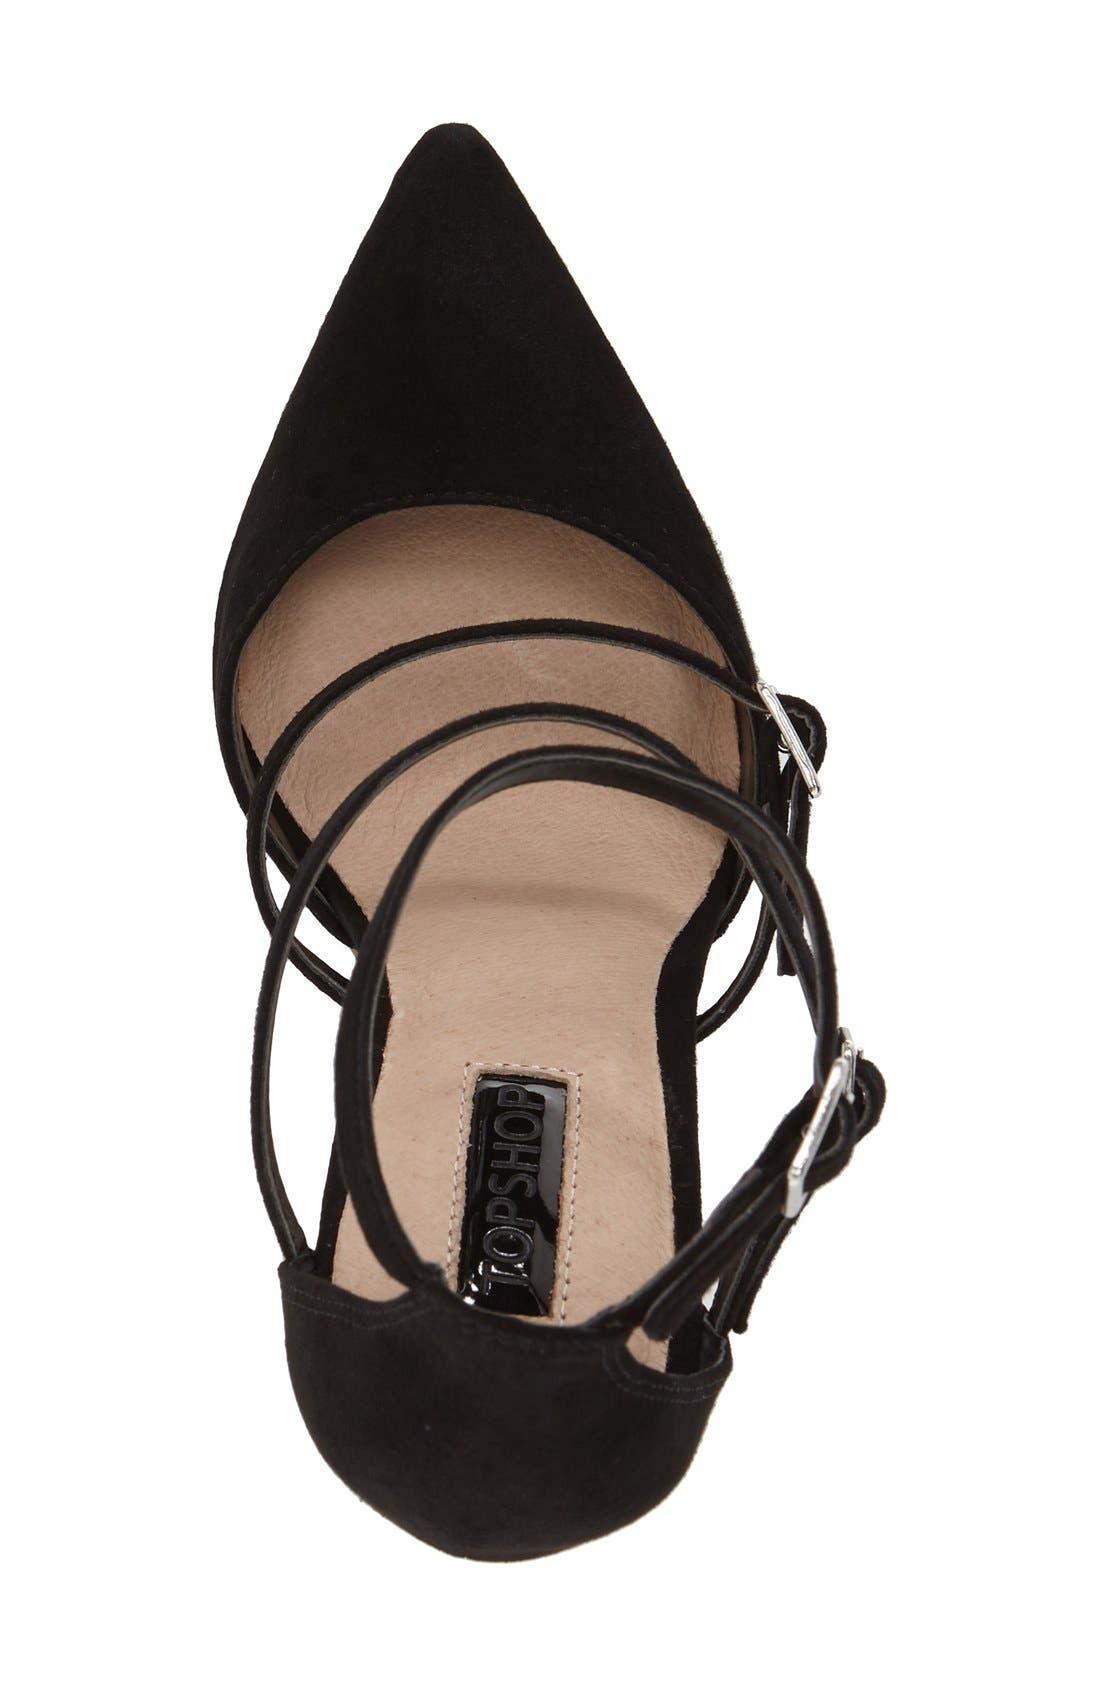 'Giselle' Buckle Sandal,                             Alternate thumbnail 4, color,                             001